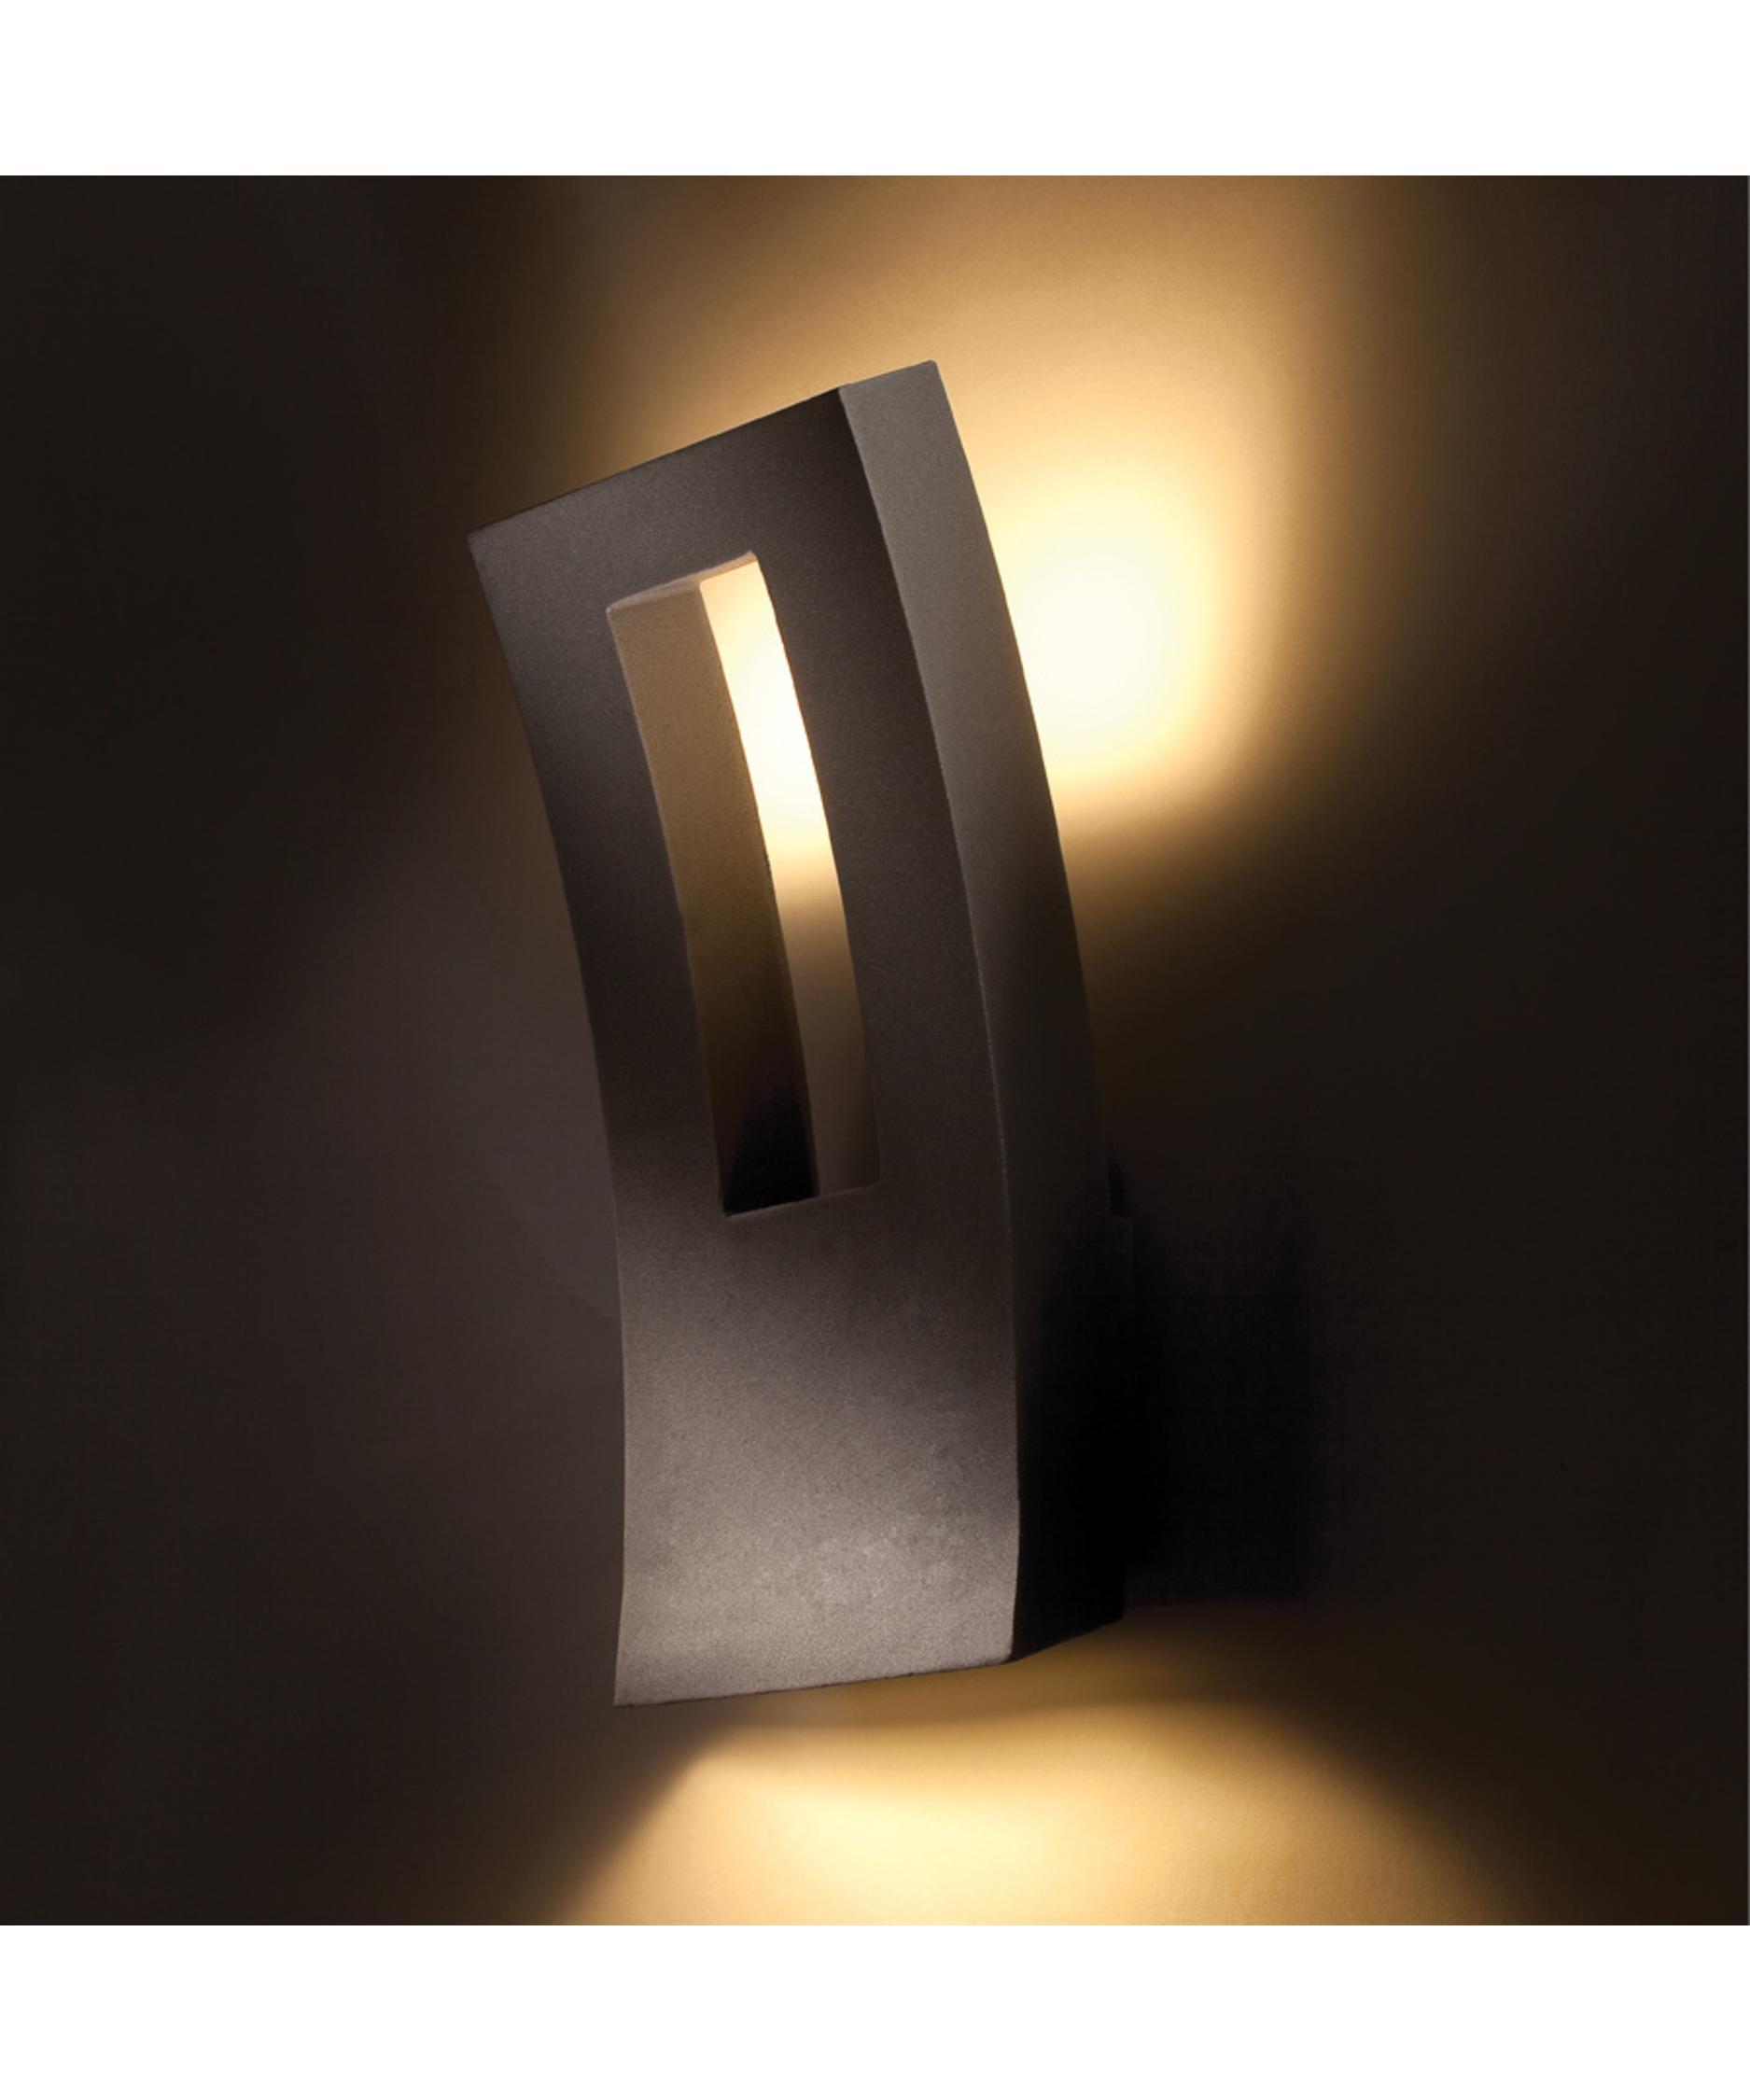 Wall light fixtures photo